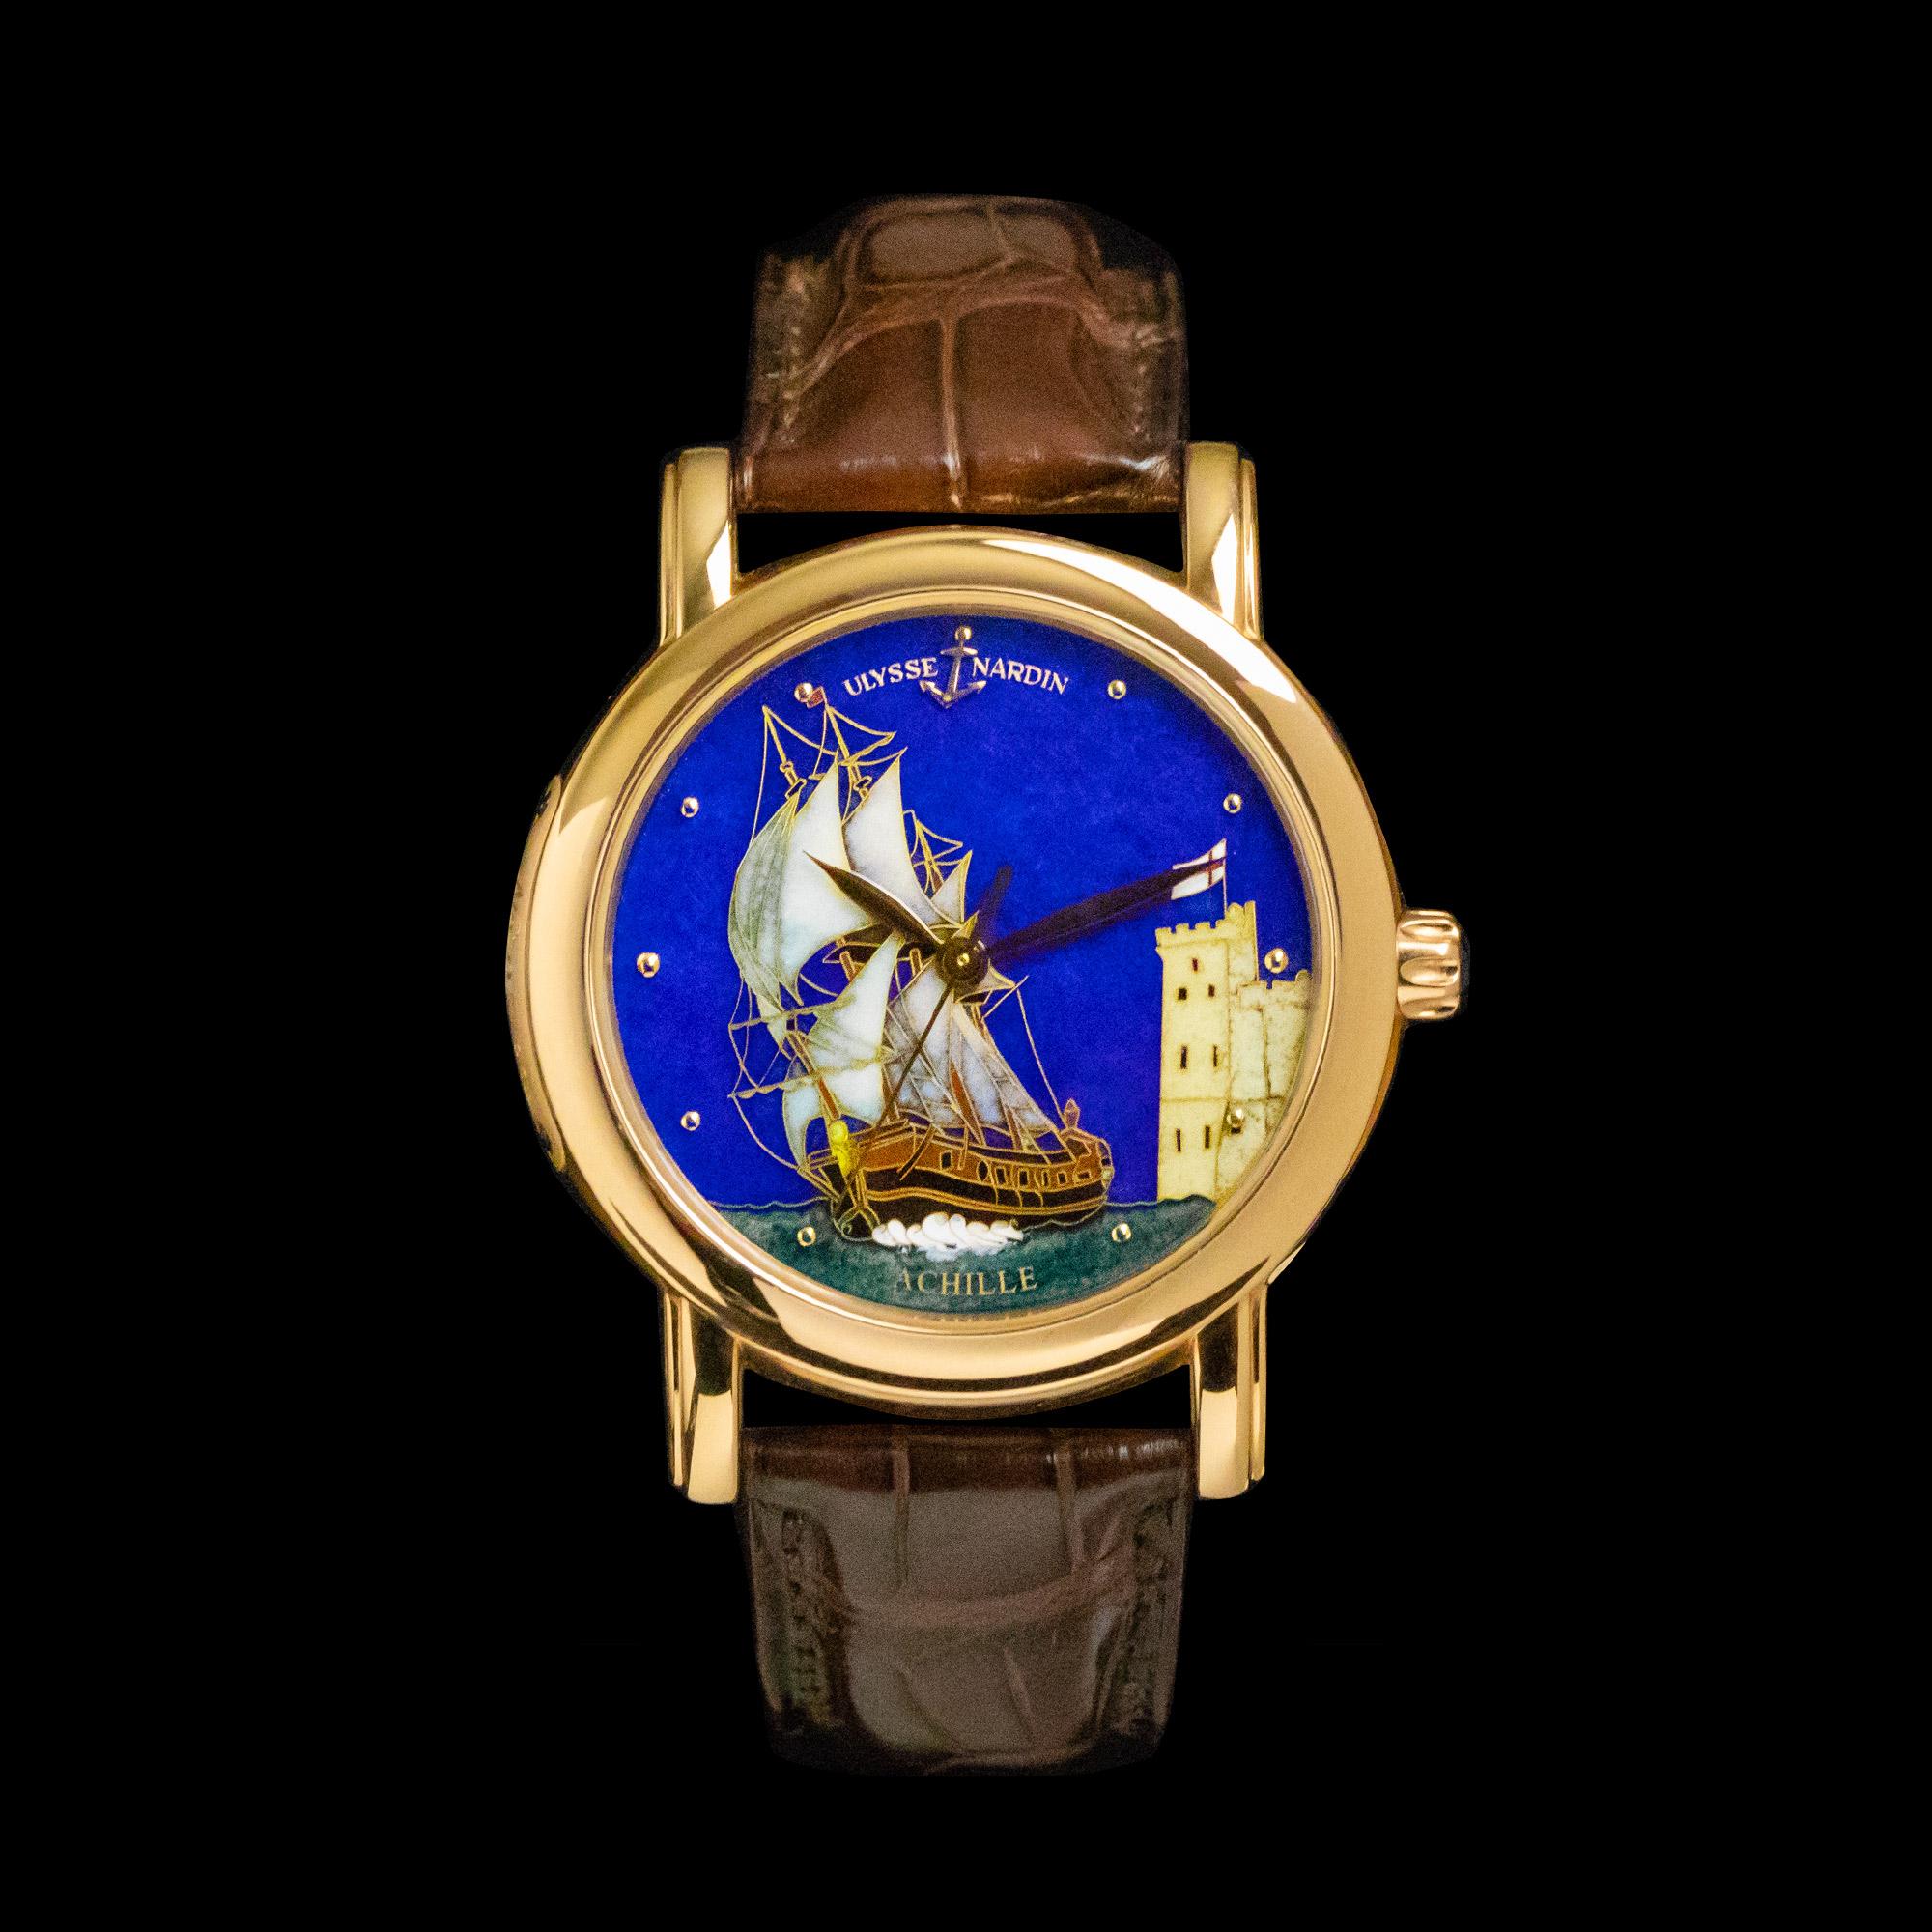 Marques de montres de luxe: Ulysse Nardin.